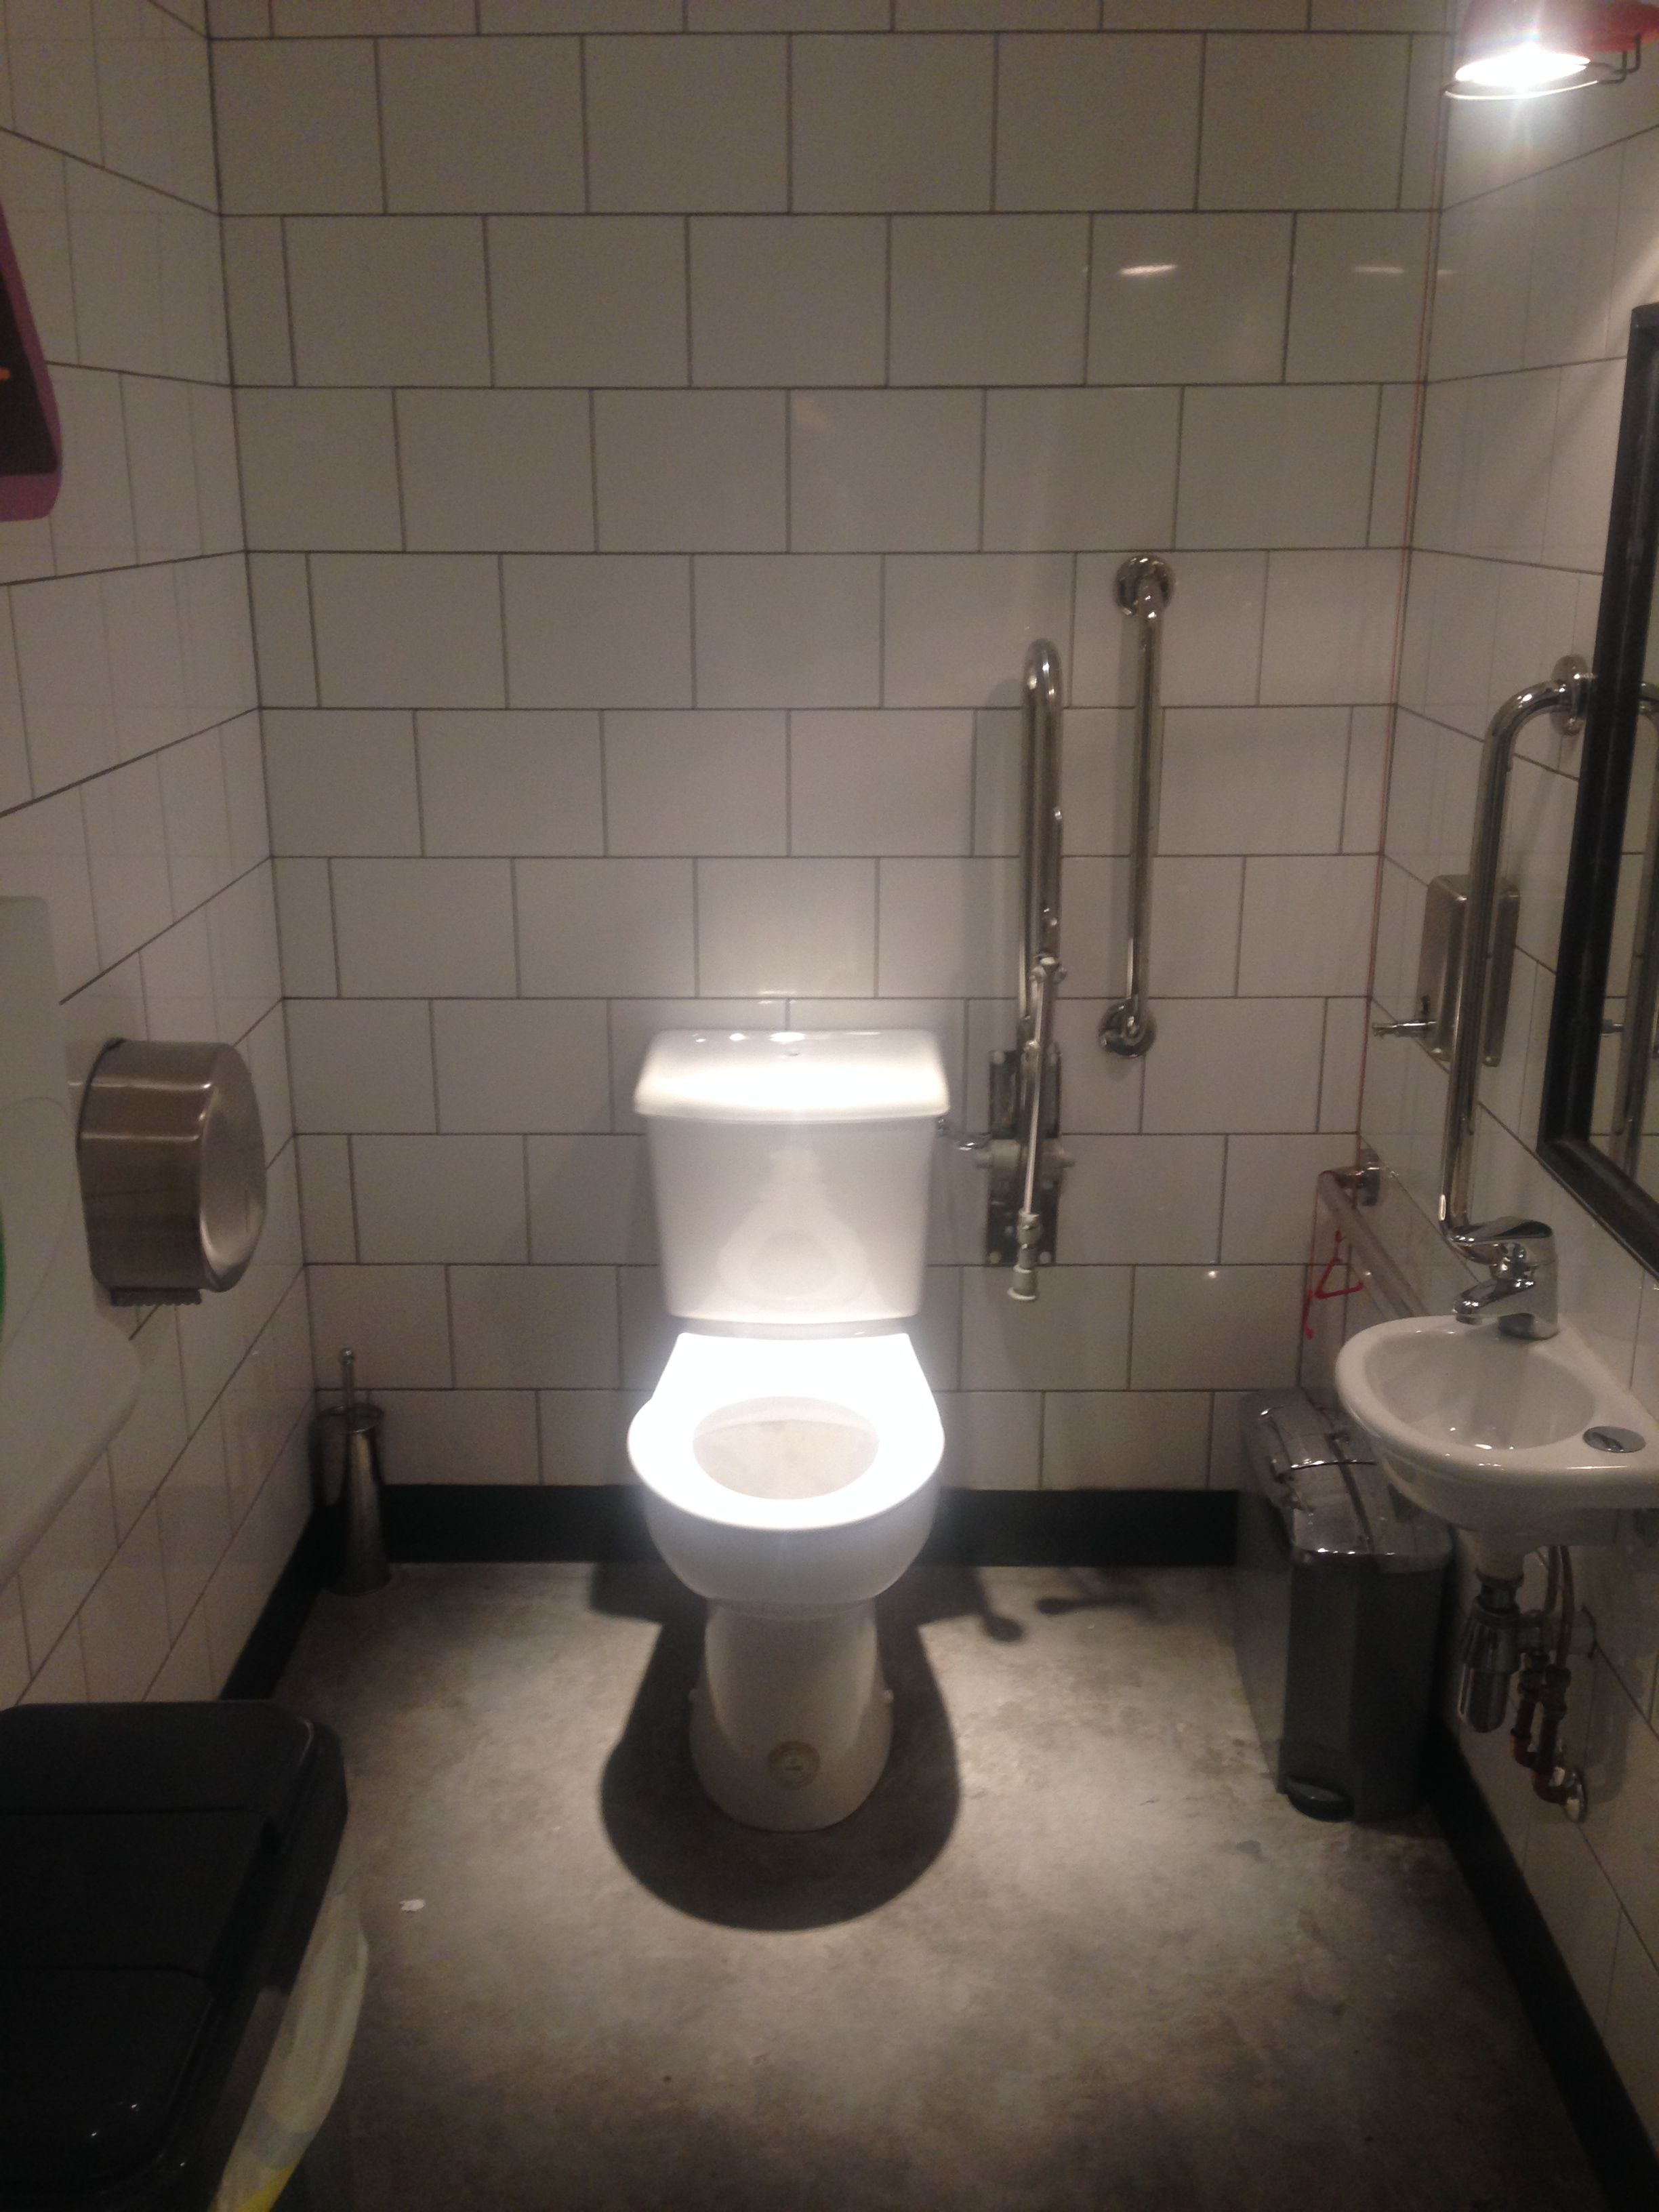 toilet tiles  toilet tiles Toilets Pinterest Toilet tiles Toilets and Tile. Tiles For Toilets   Descargas Mundiales com